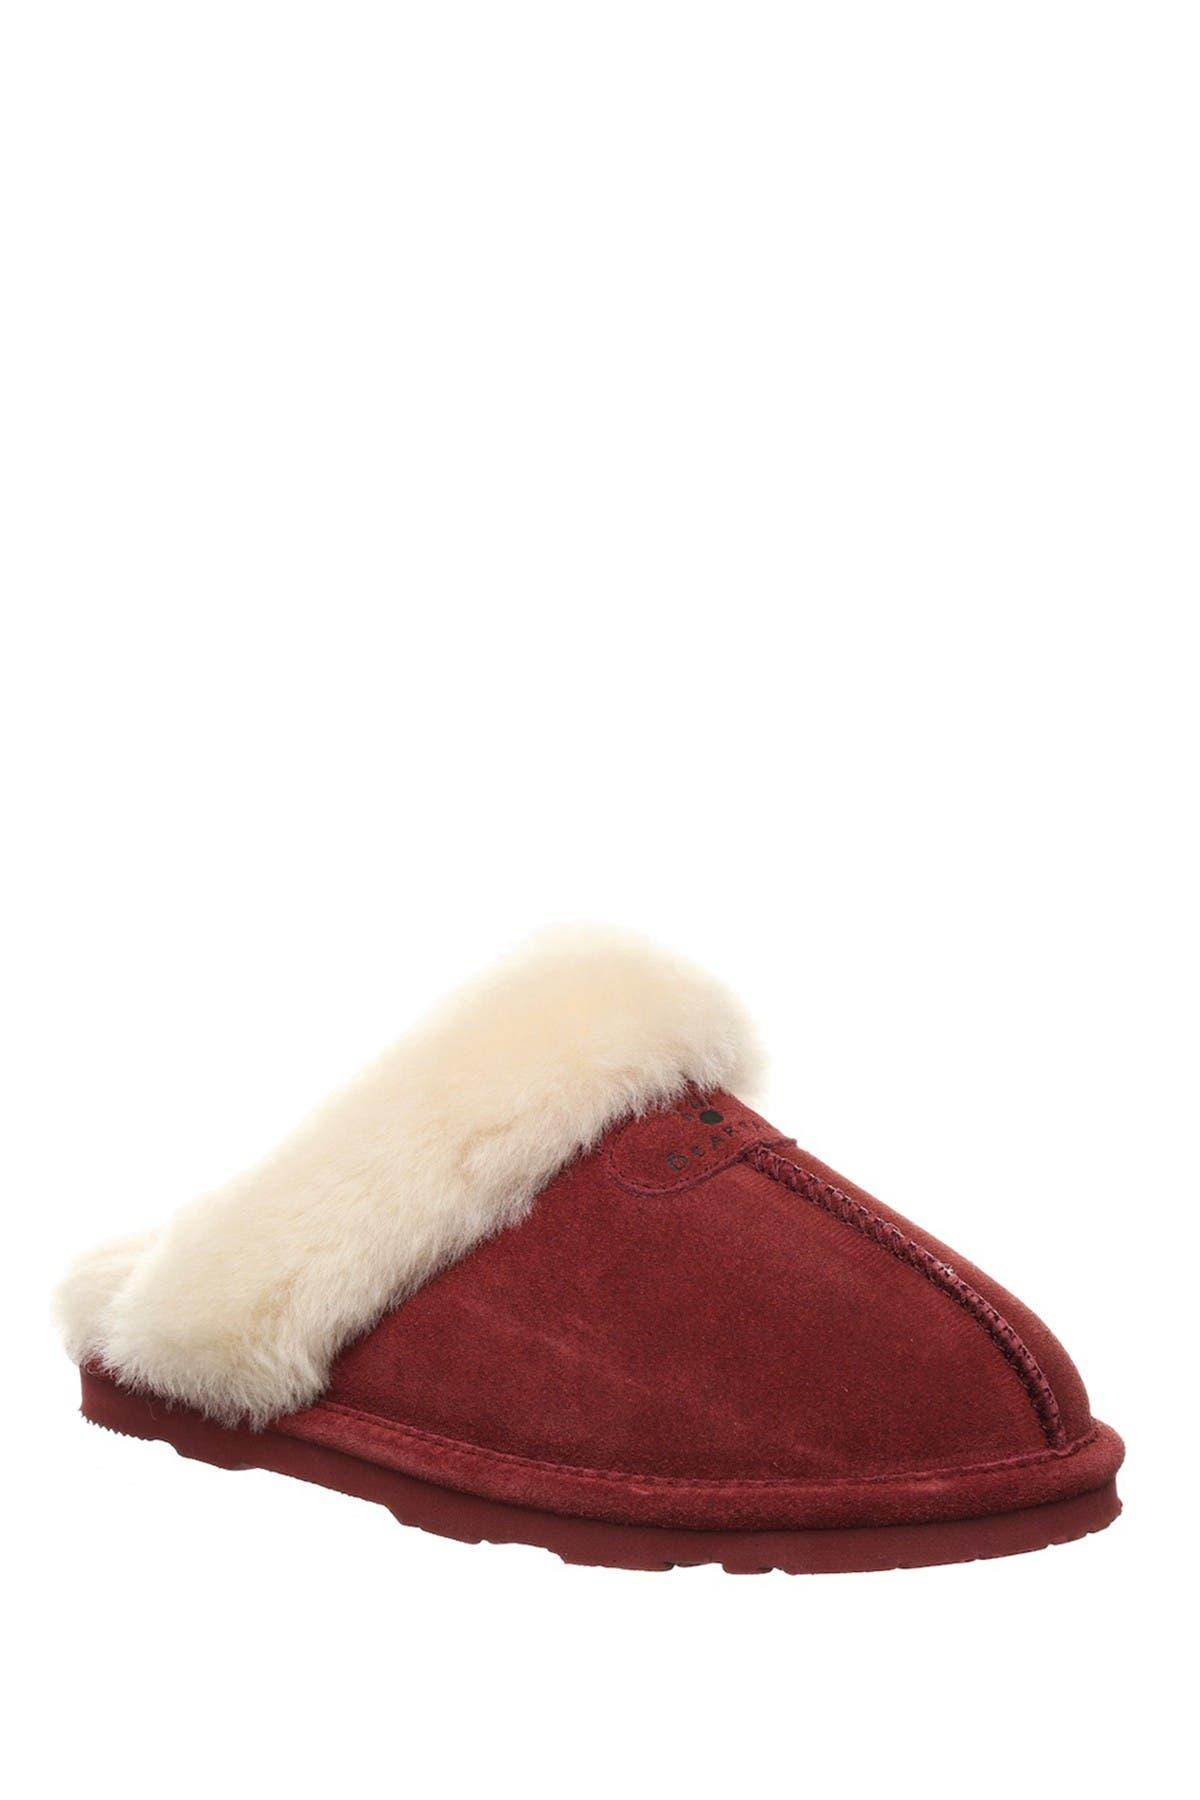 Image of BEARPAW Loki II Genuine Sheepskin Fur Lined Slipper